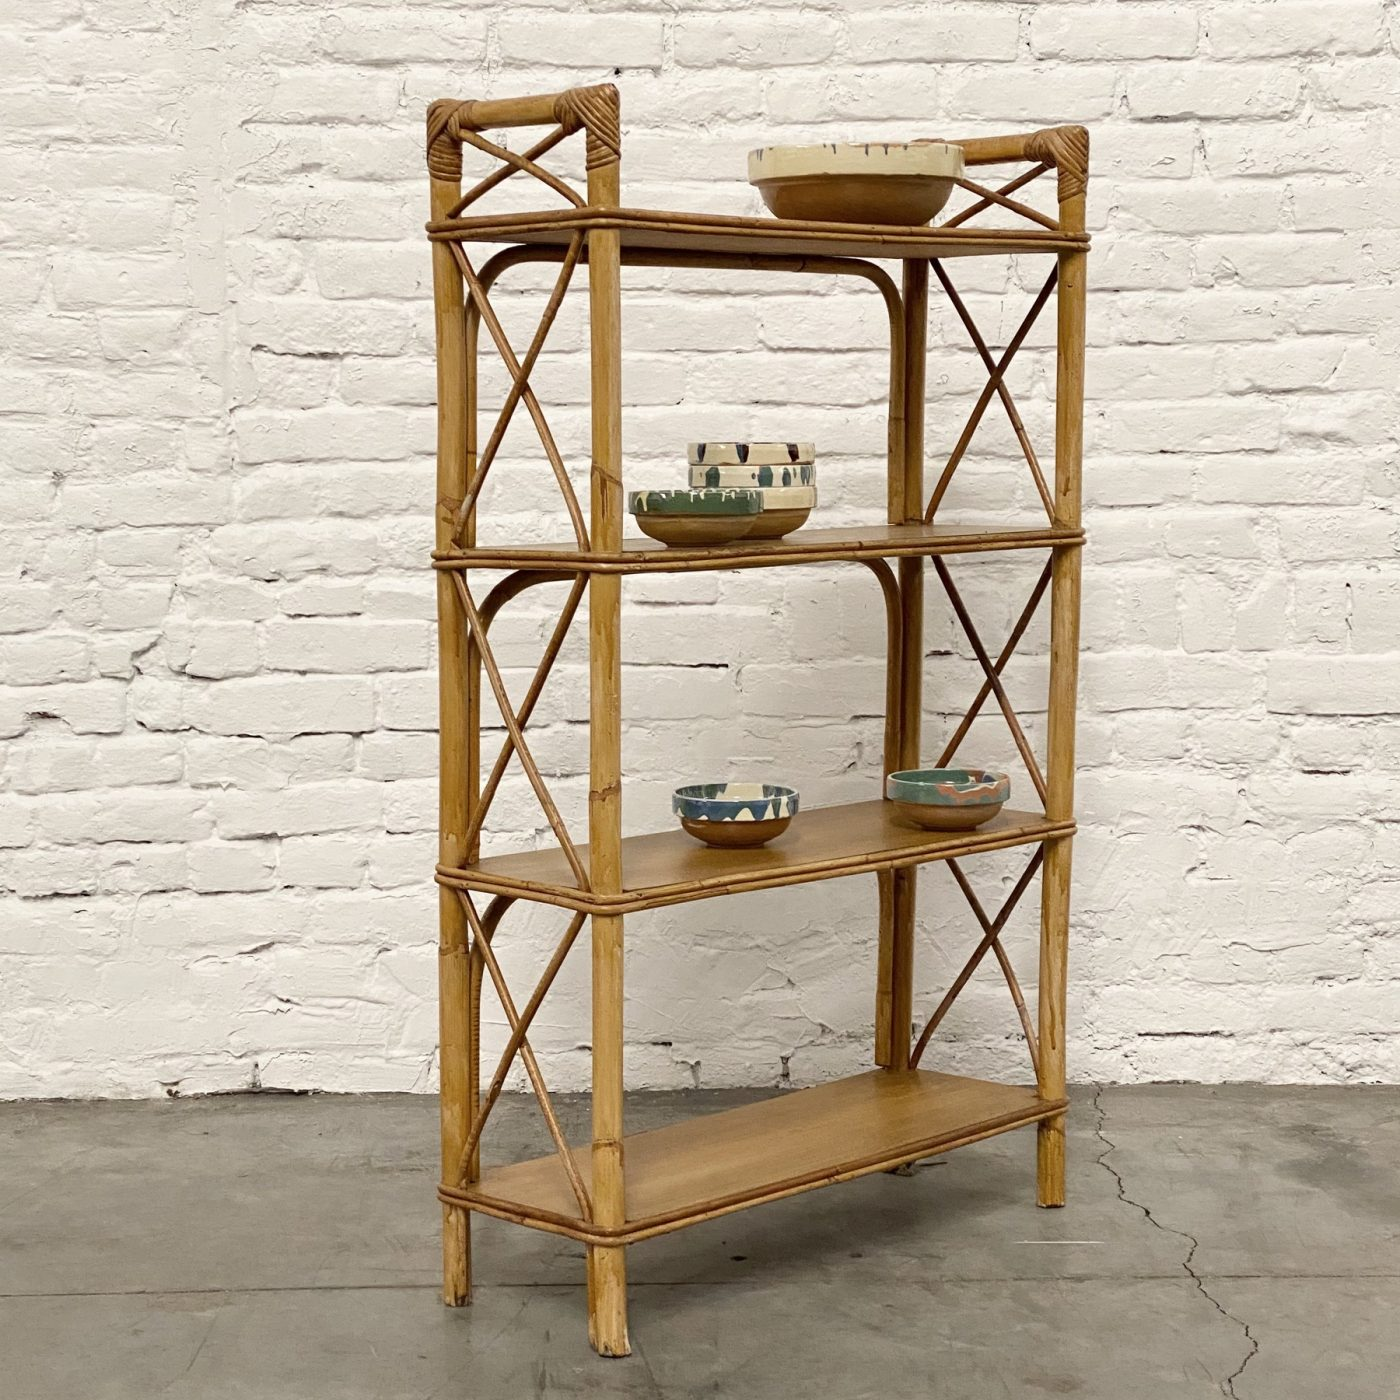 objet-vagabond-rattan-shelf0007